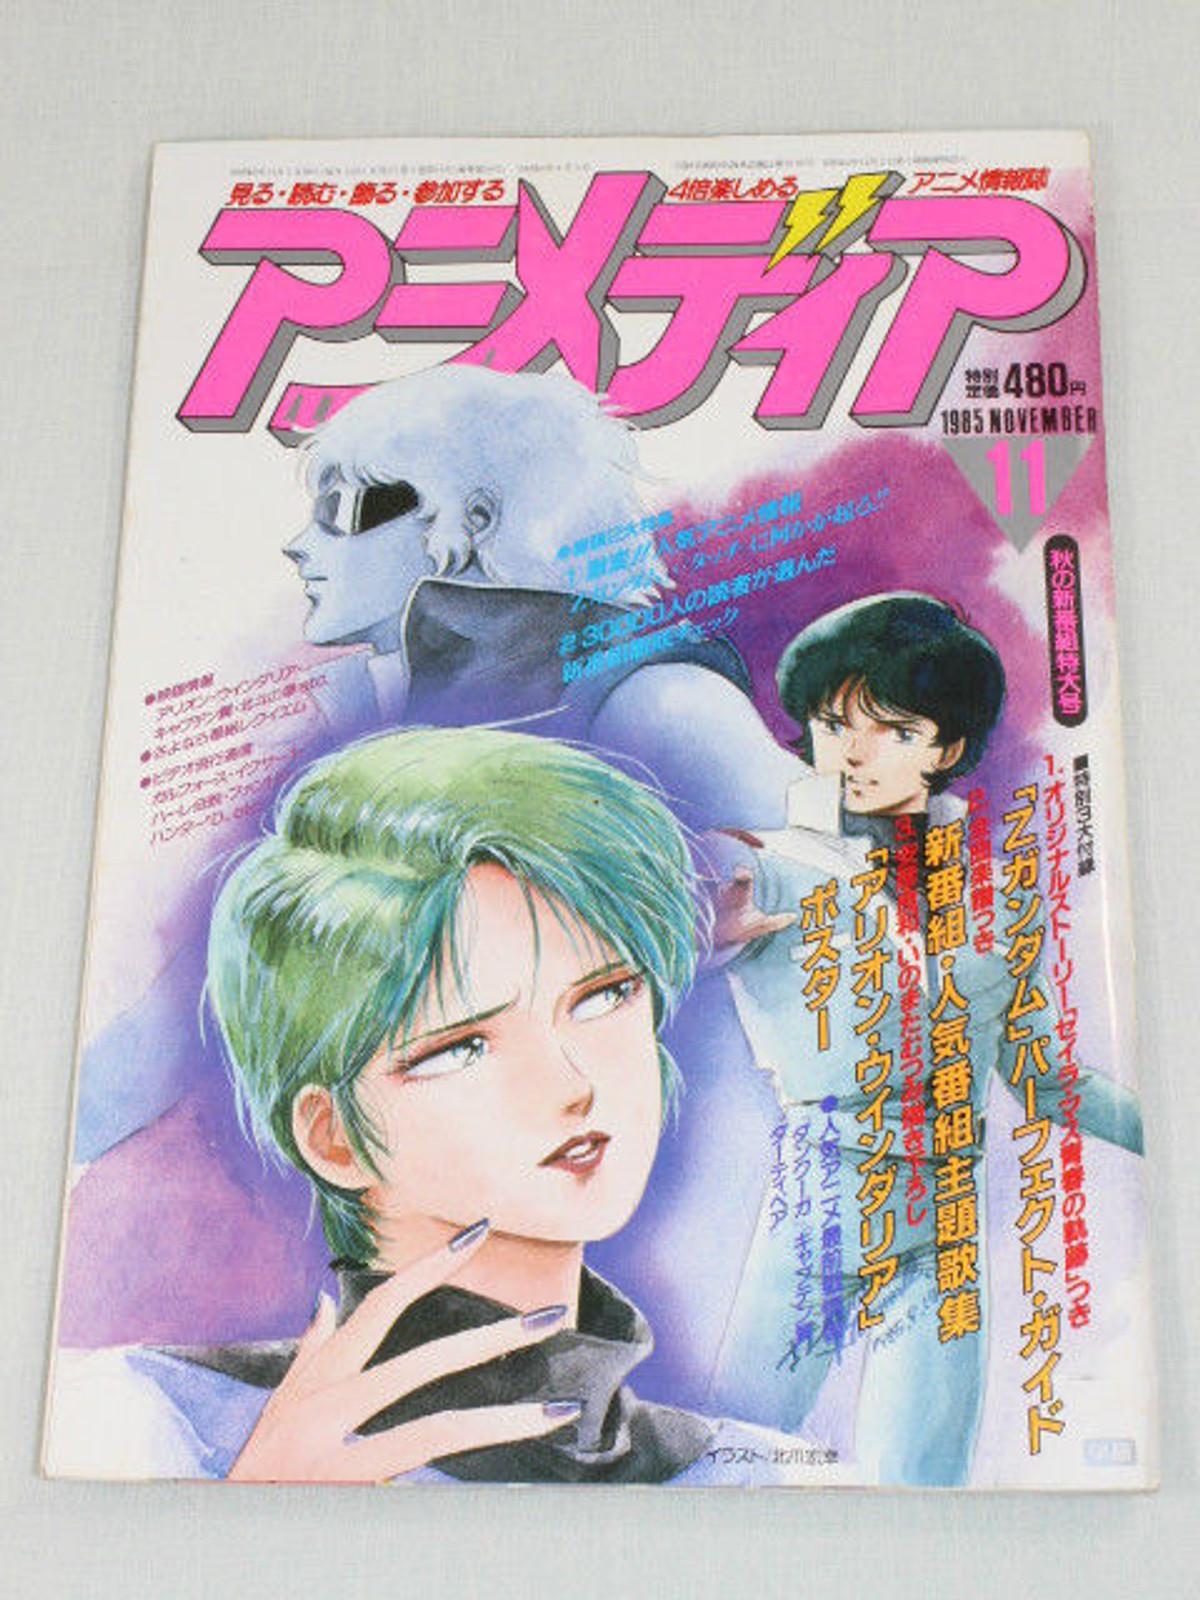 Animedia Japan Anime Magazine 11/1985 Vol.56 Gakken / Z GUNDAM TOUCH DANCOUGA